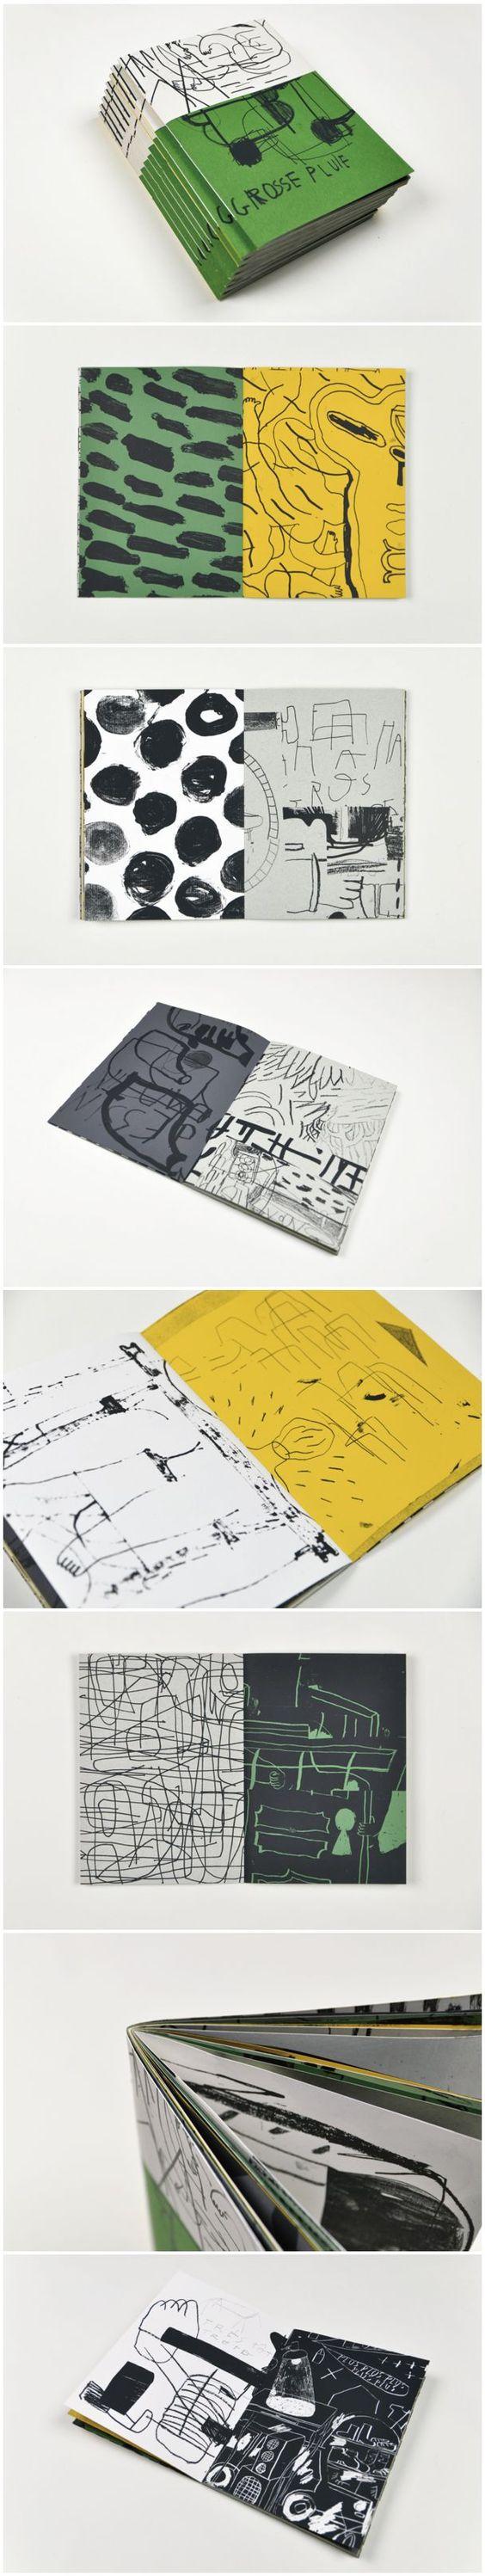 Grosse pluie | Screen printed book by Marion Jdanoff and Damien Tran: